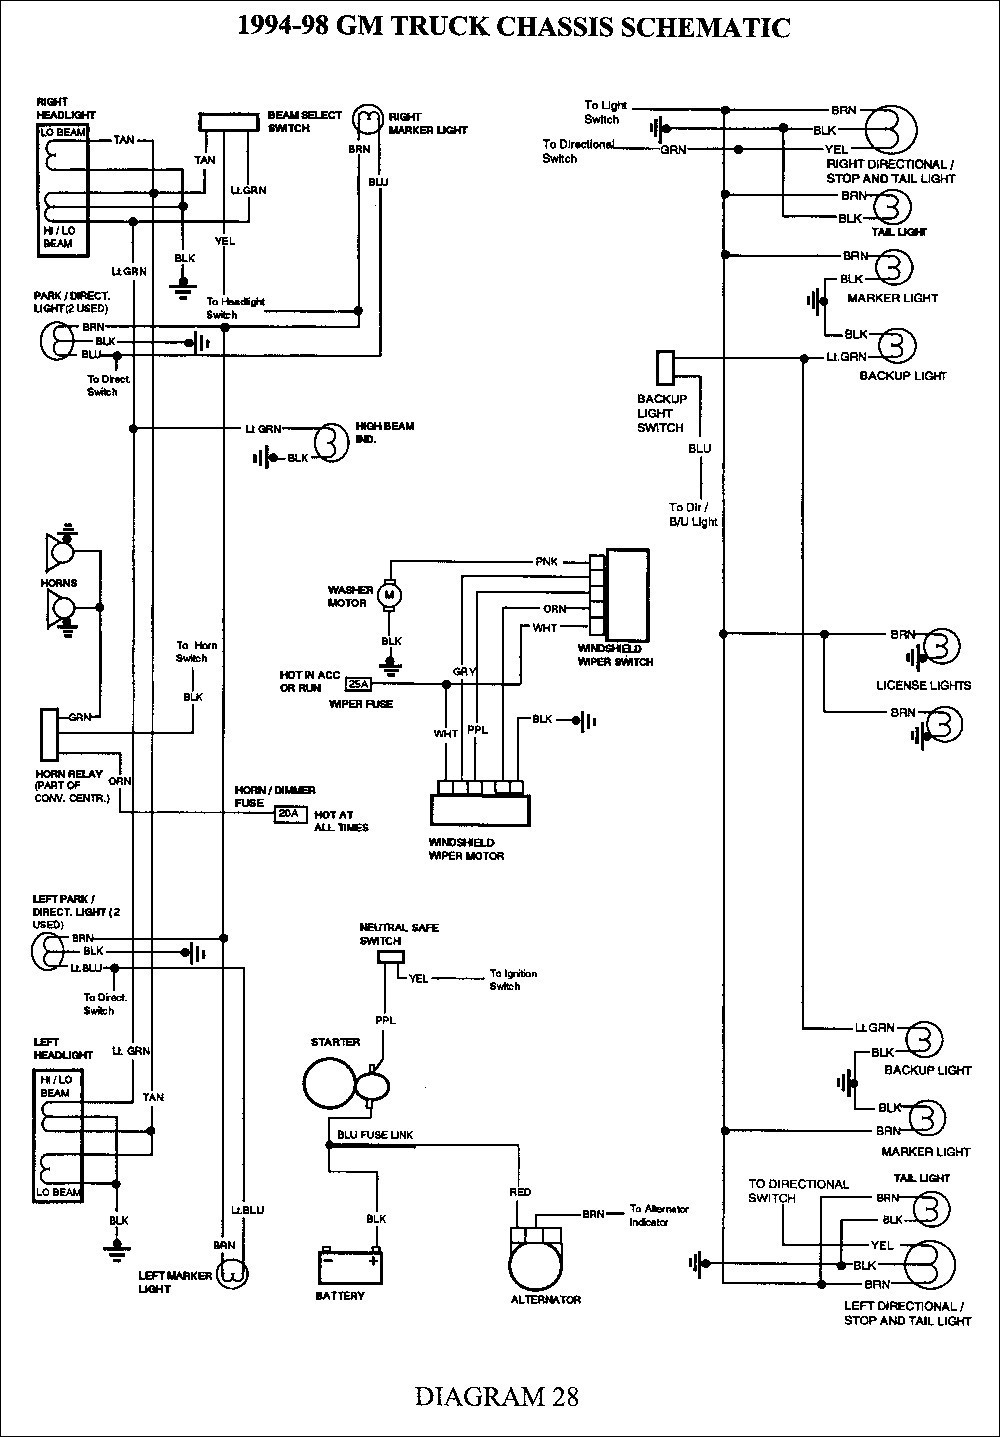 2001 chevy silverado trailer wiring diagram elegant repair guides 2001 chevy truck tail light wiring diagram